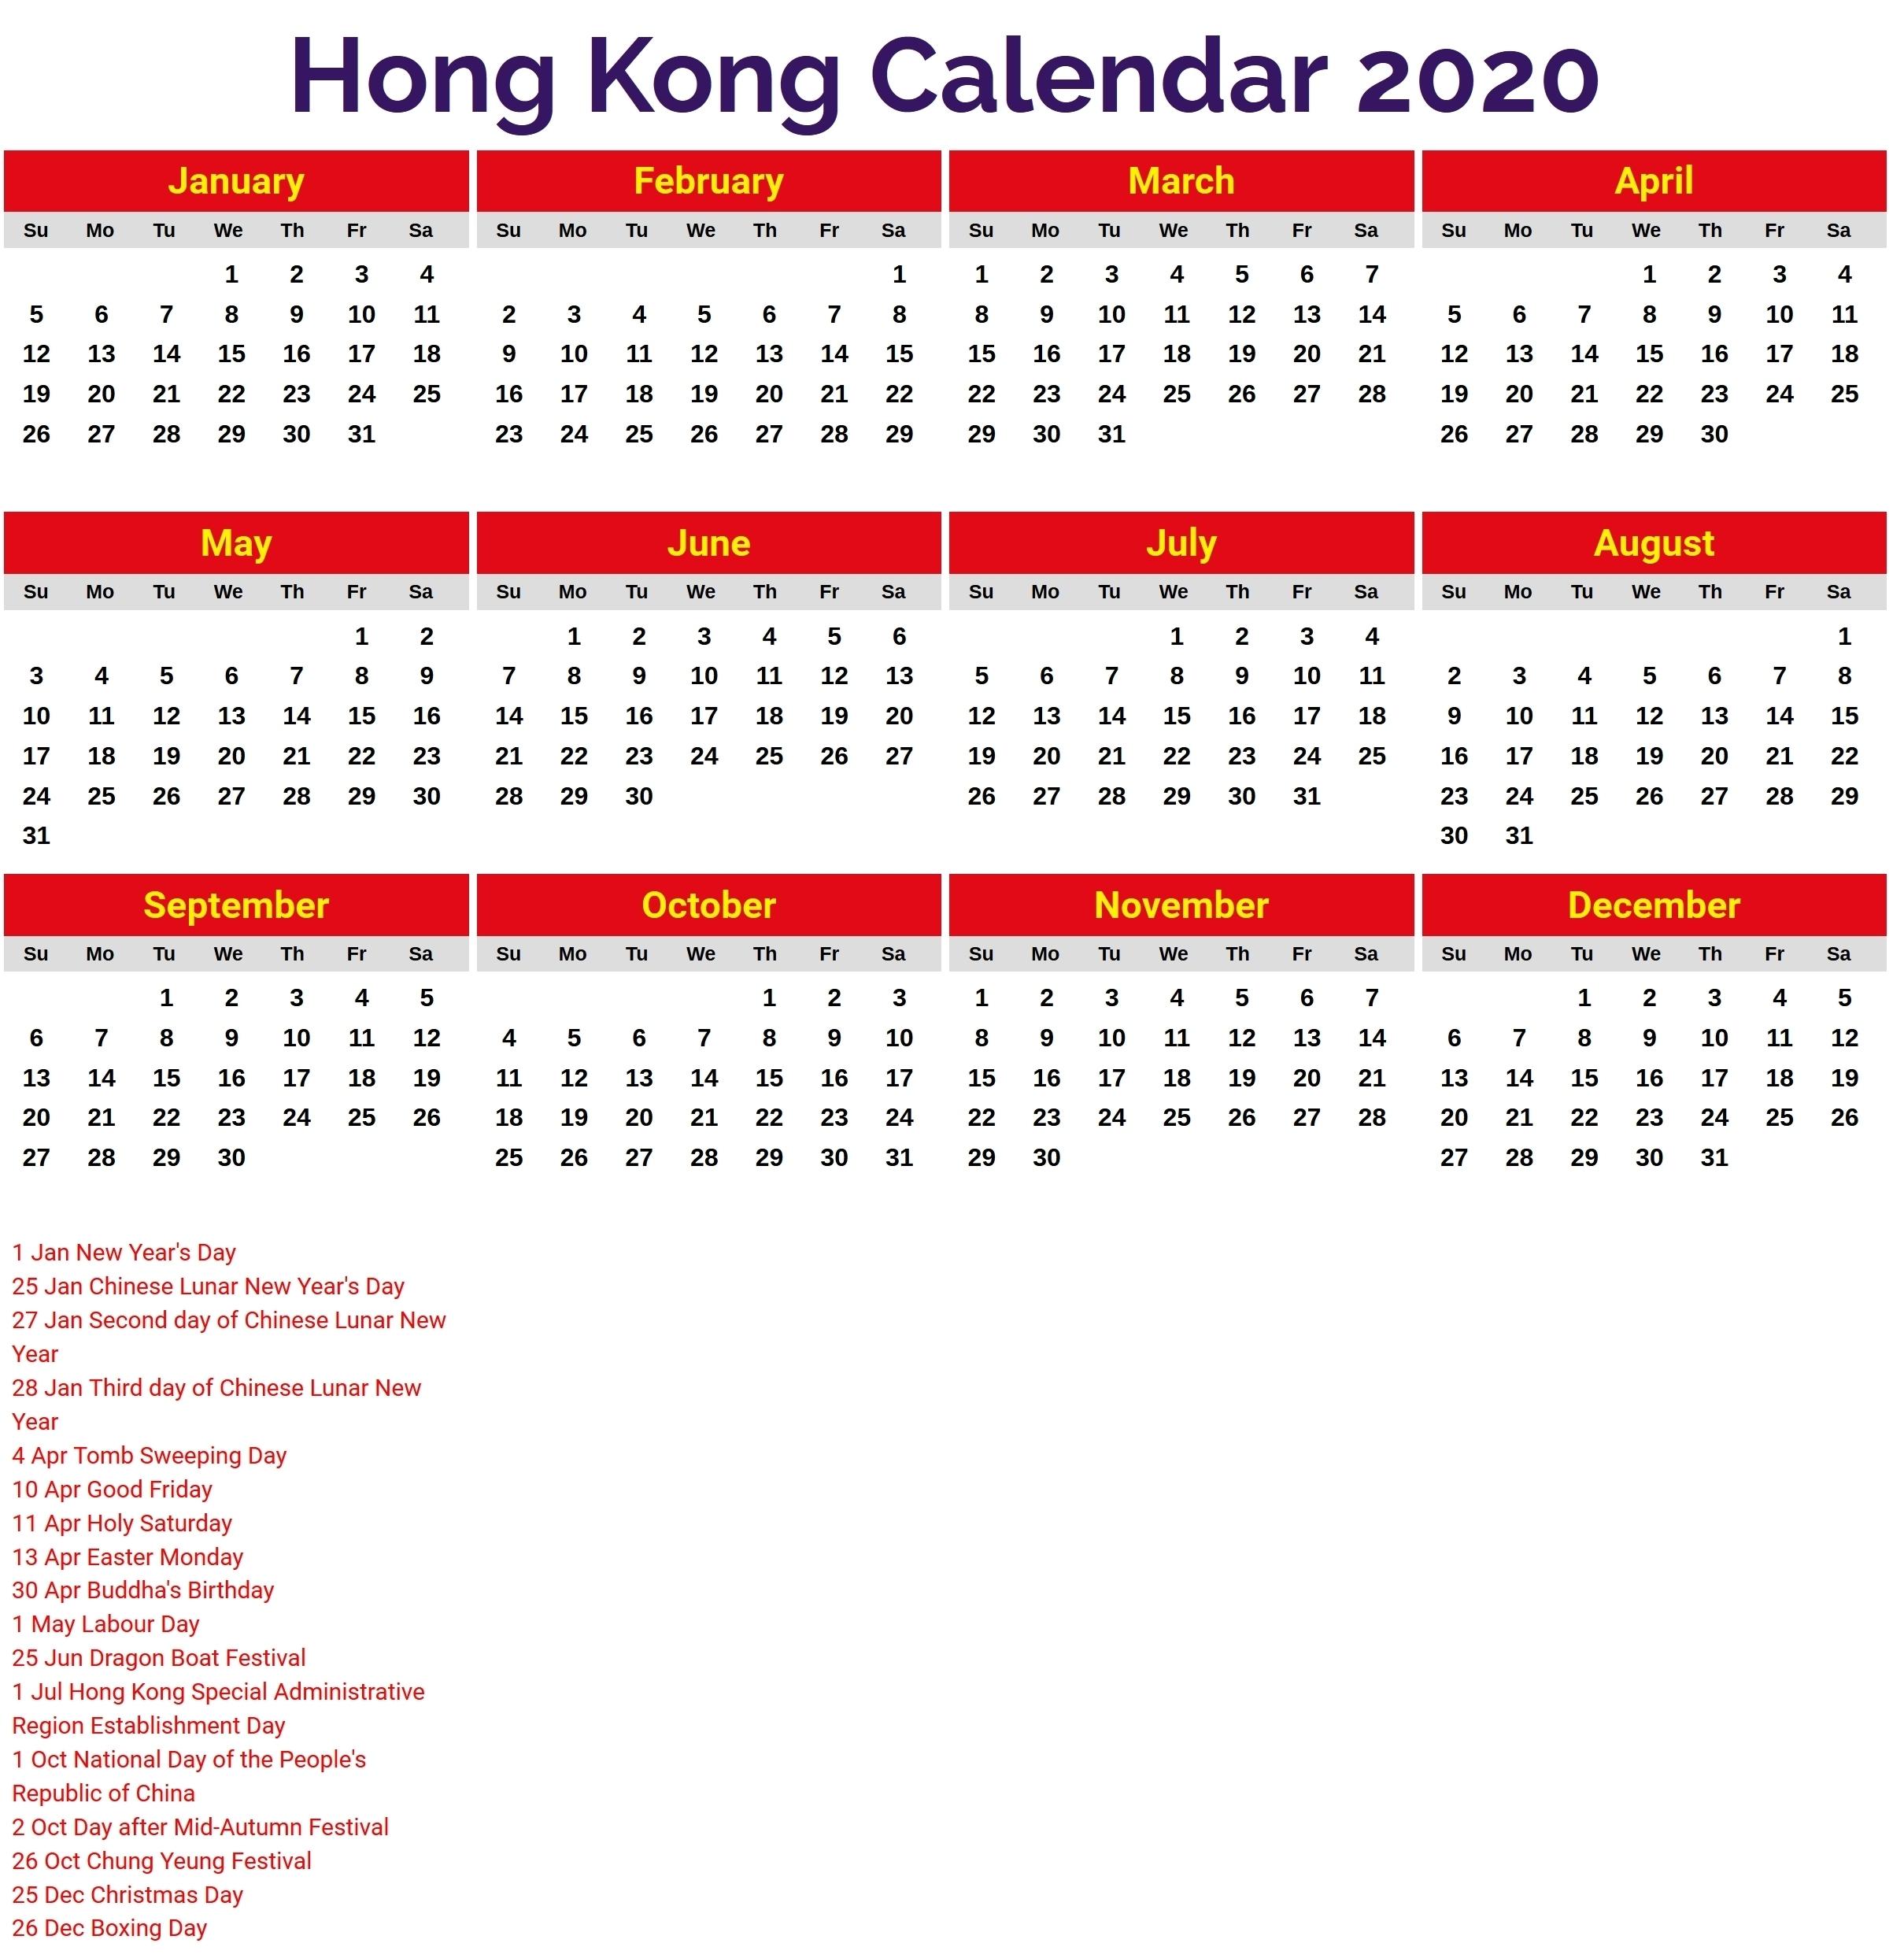 Hong Kong Calendar 2020 | Free Printable Calendar-Hong Kong